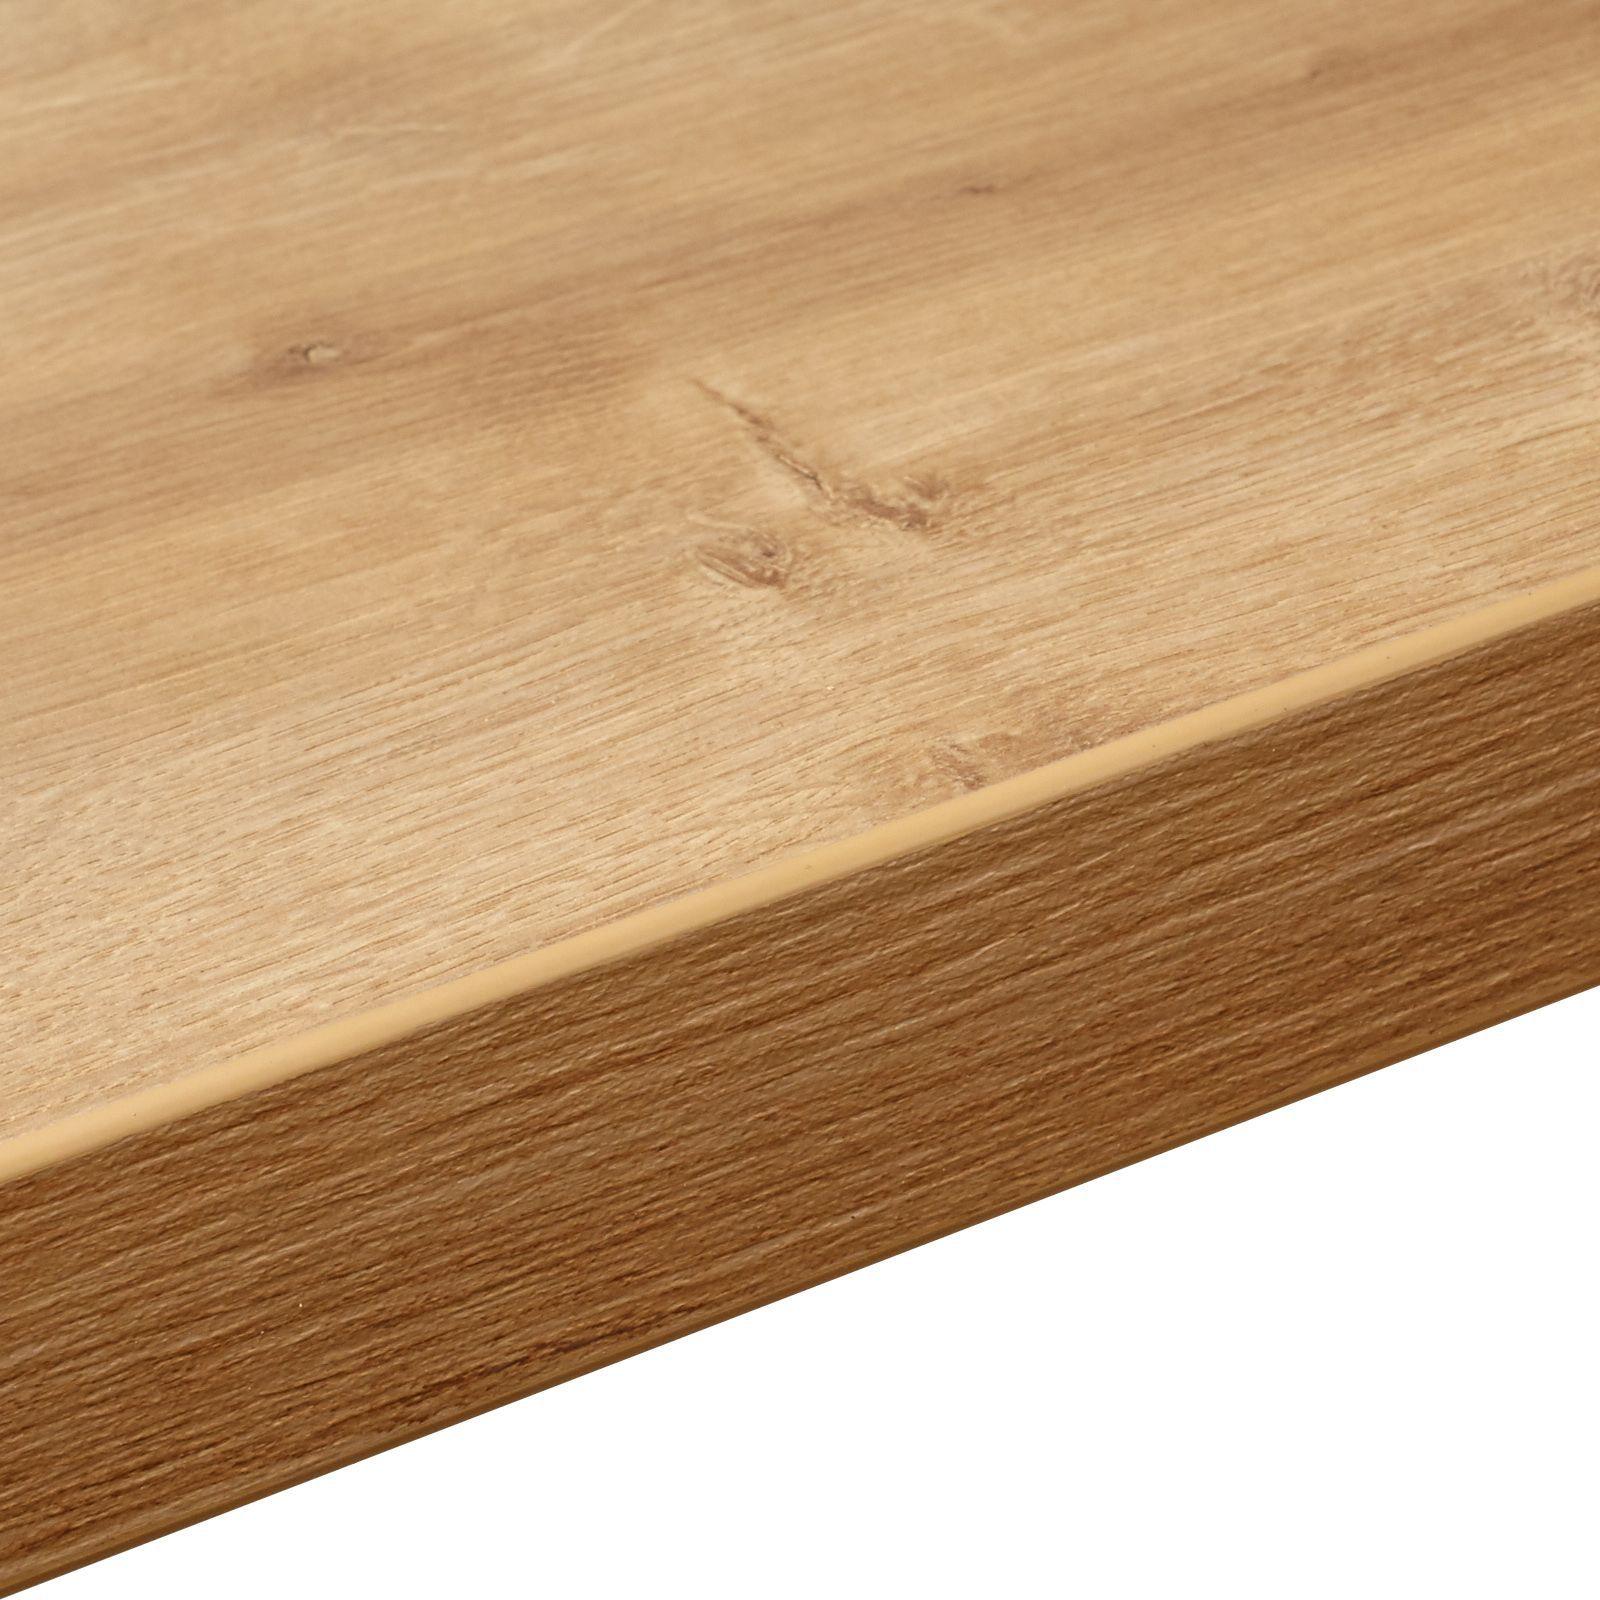 38mm b amp q arlington oak square edge kitchen worktop l 3m